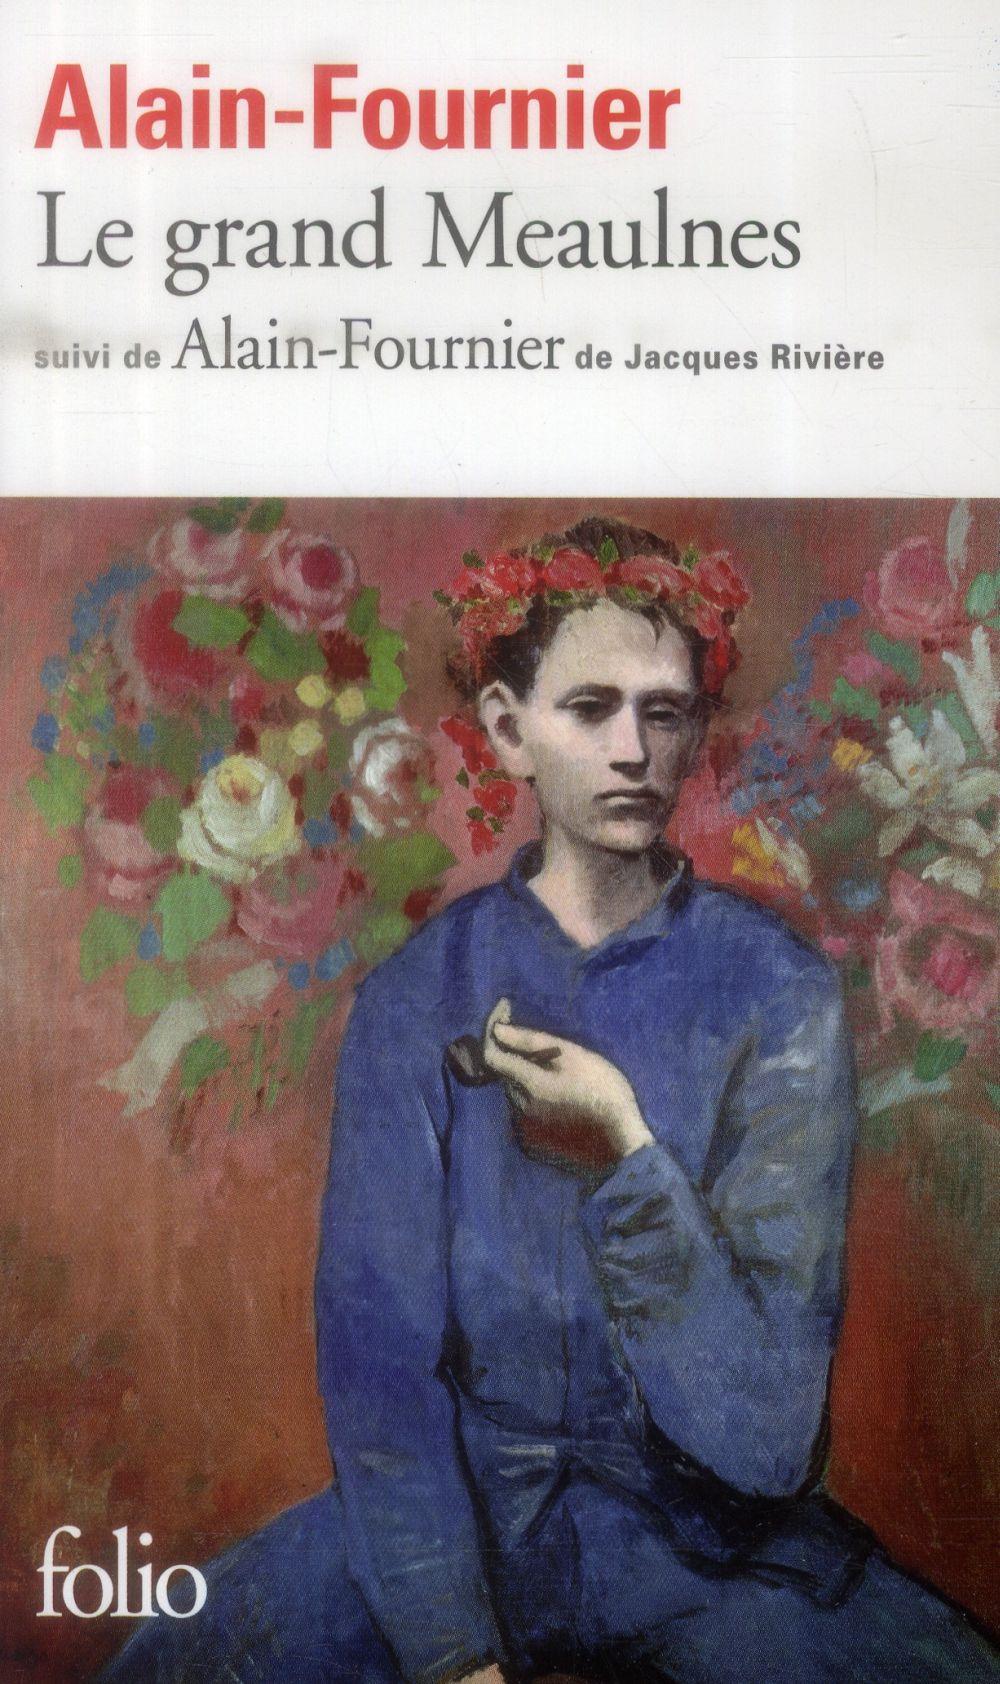 Le Grand Meaulnes ; Alain-Fournier